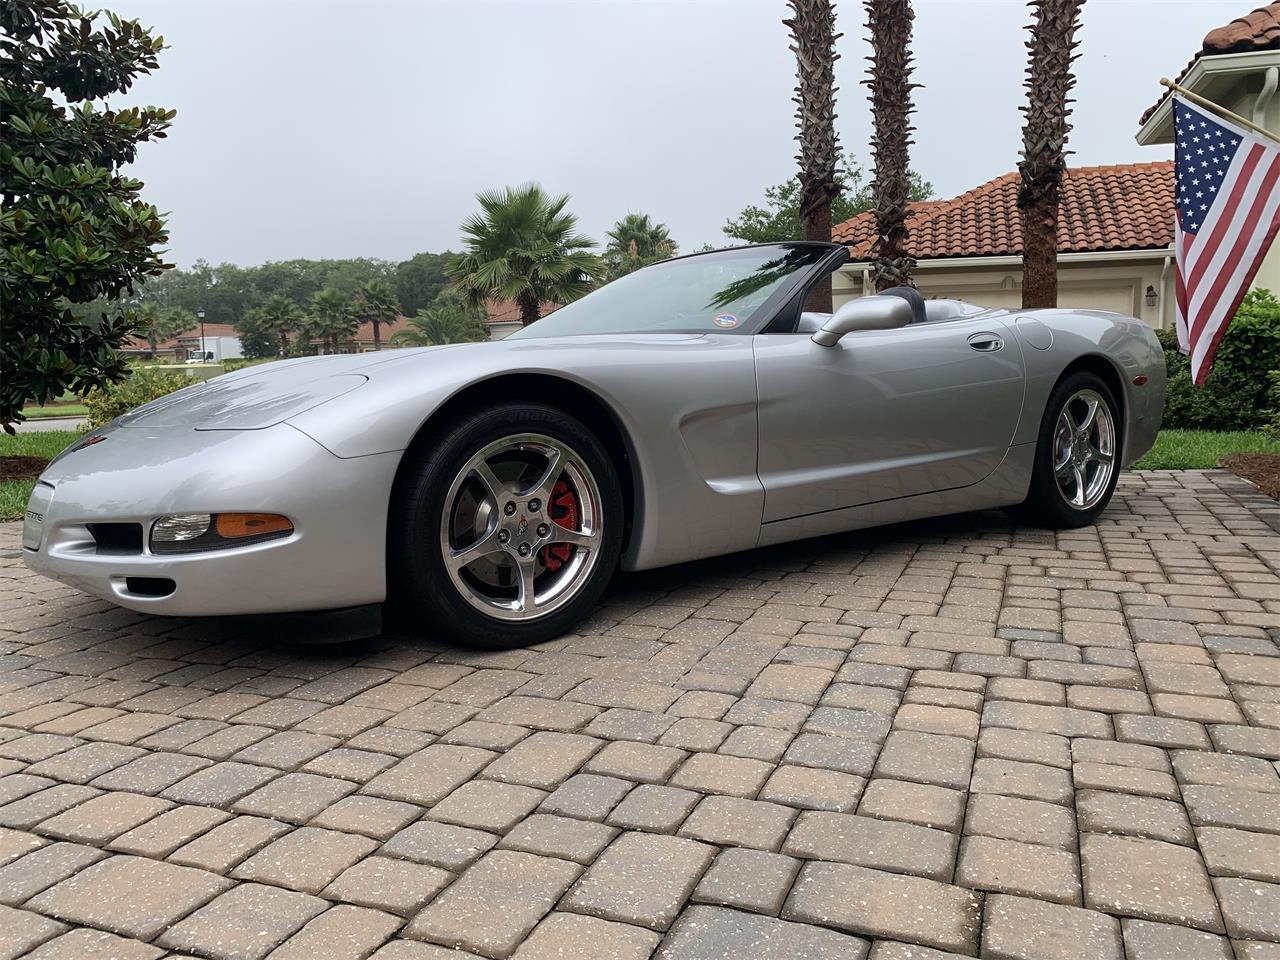 2001 Chevrolet Corvette (CC-1355794) for sale in Fernadina Beach , Florida